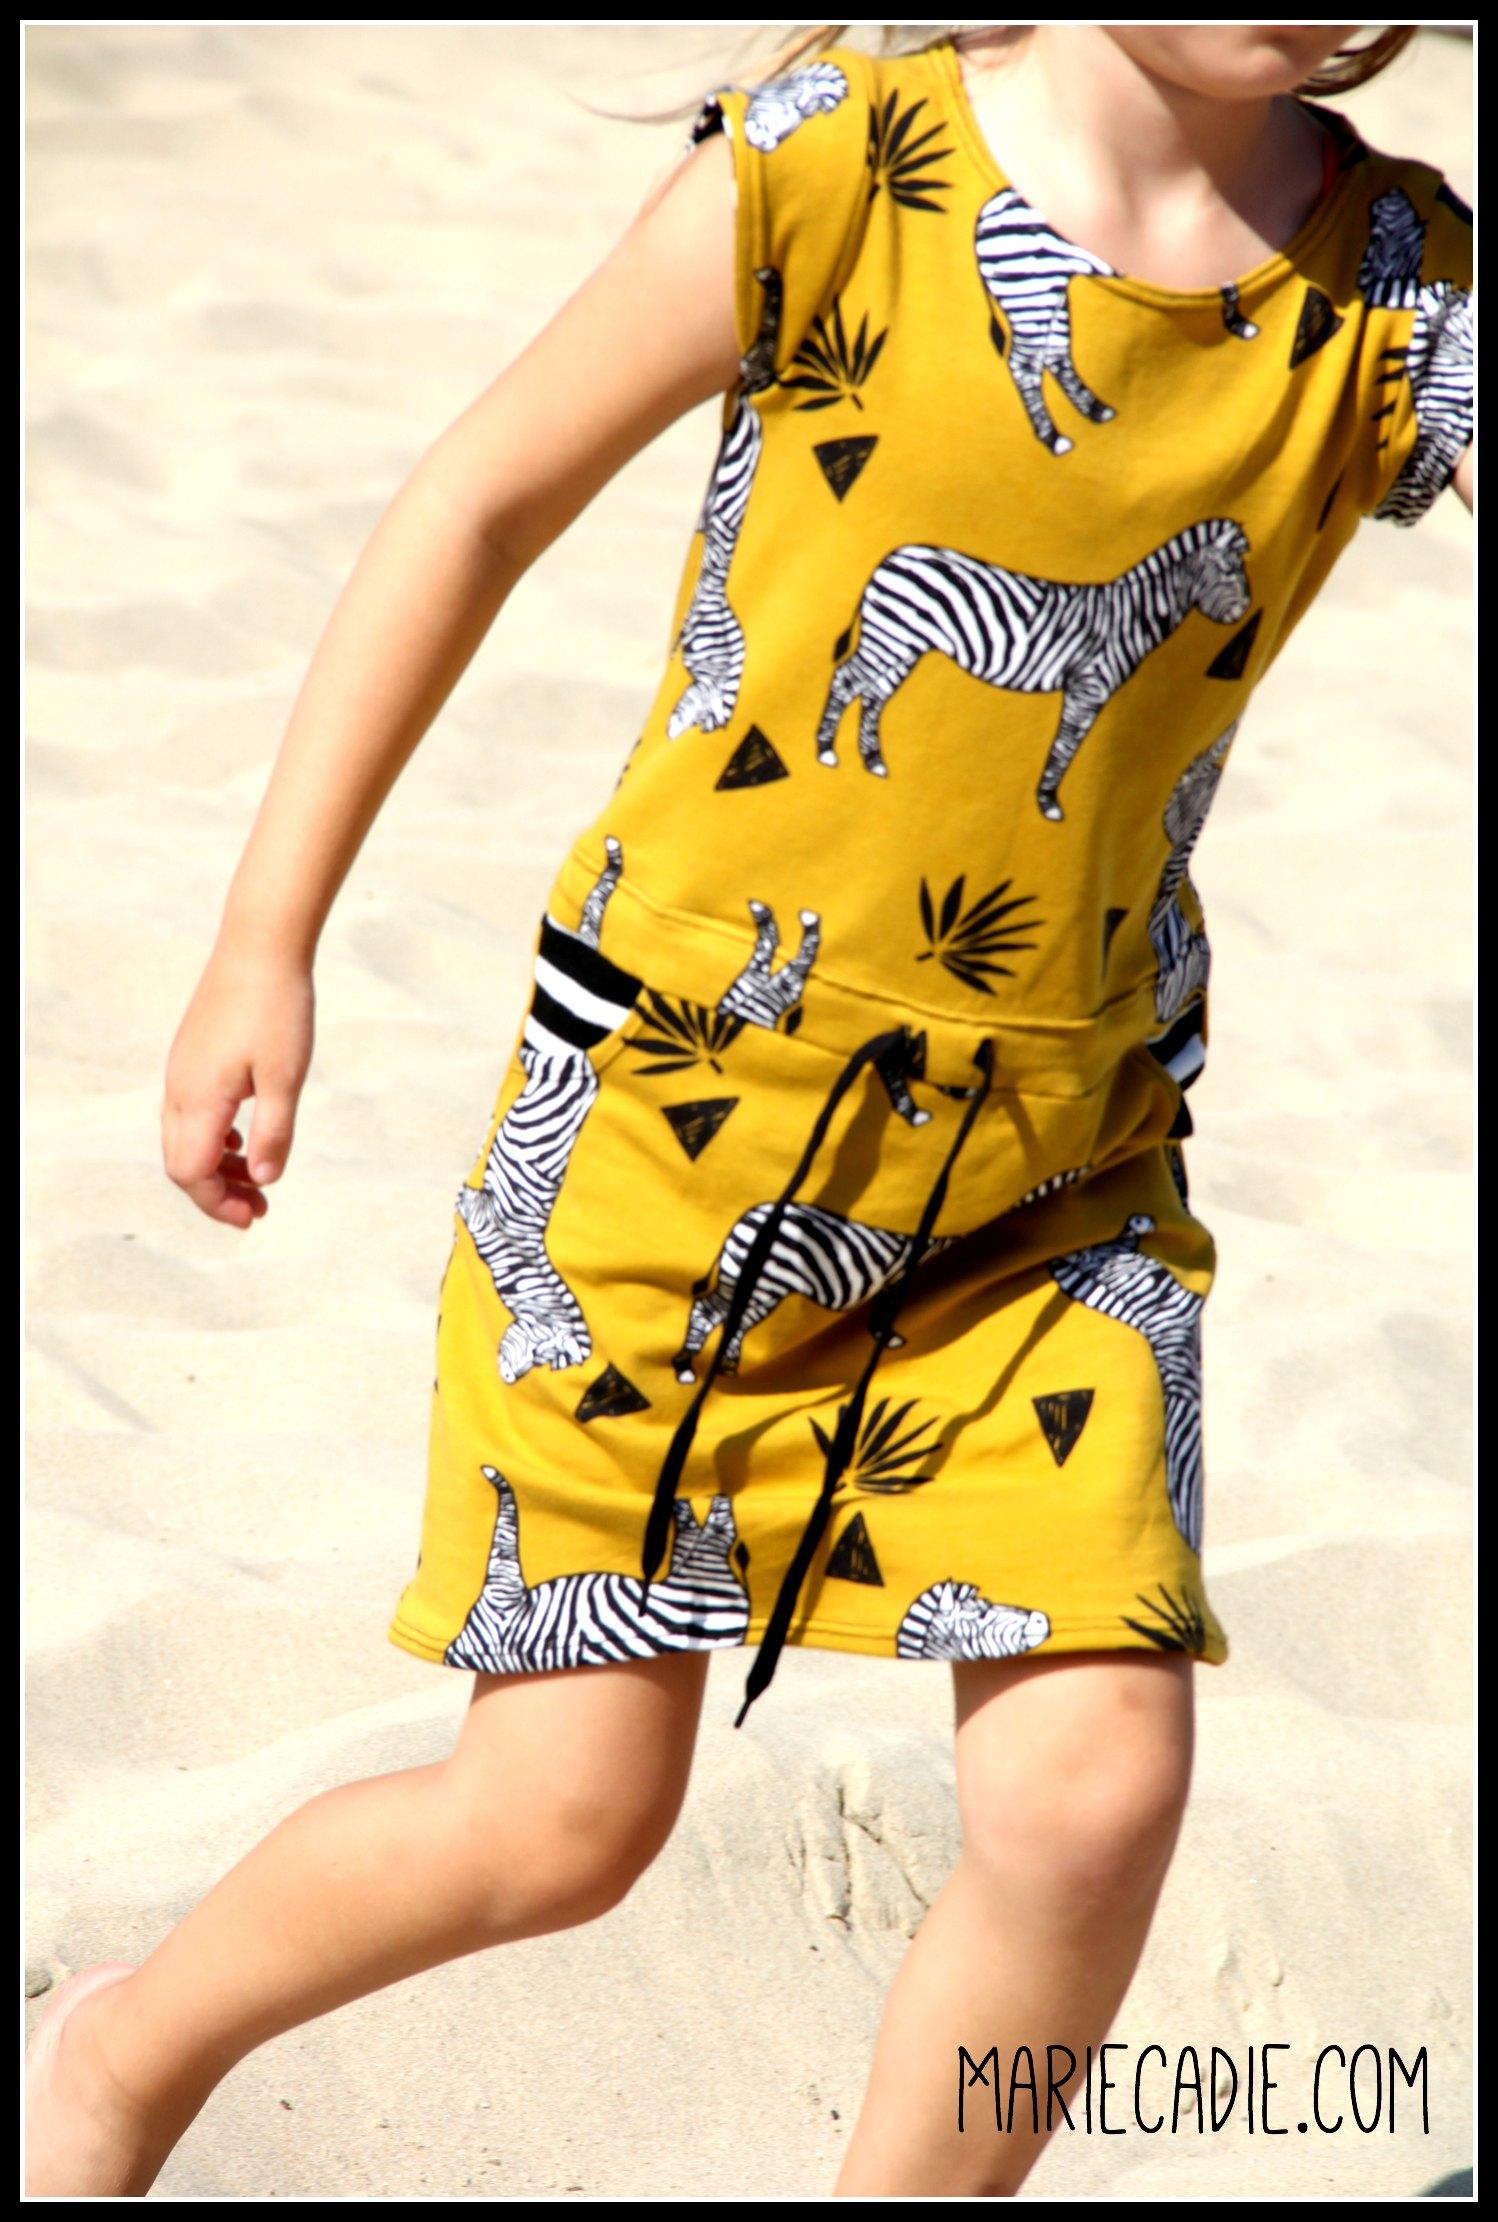 MarieCadie.com Candy Dress LMV_6